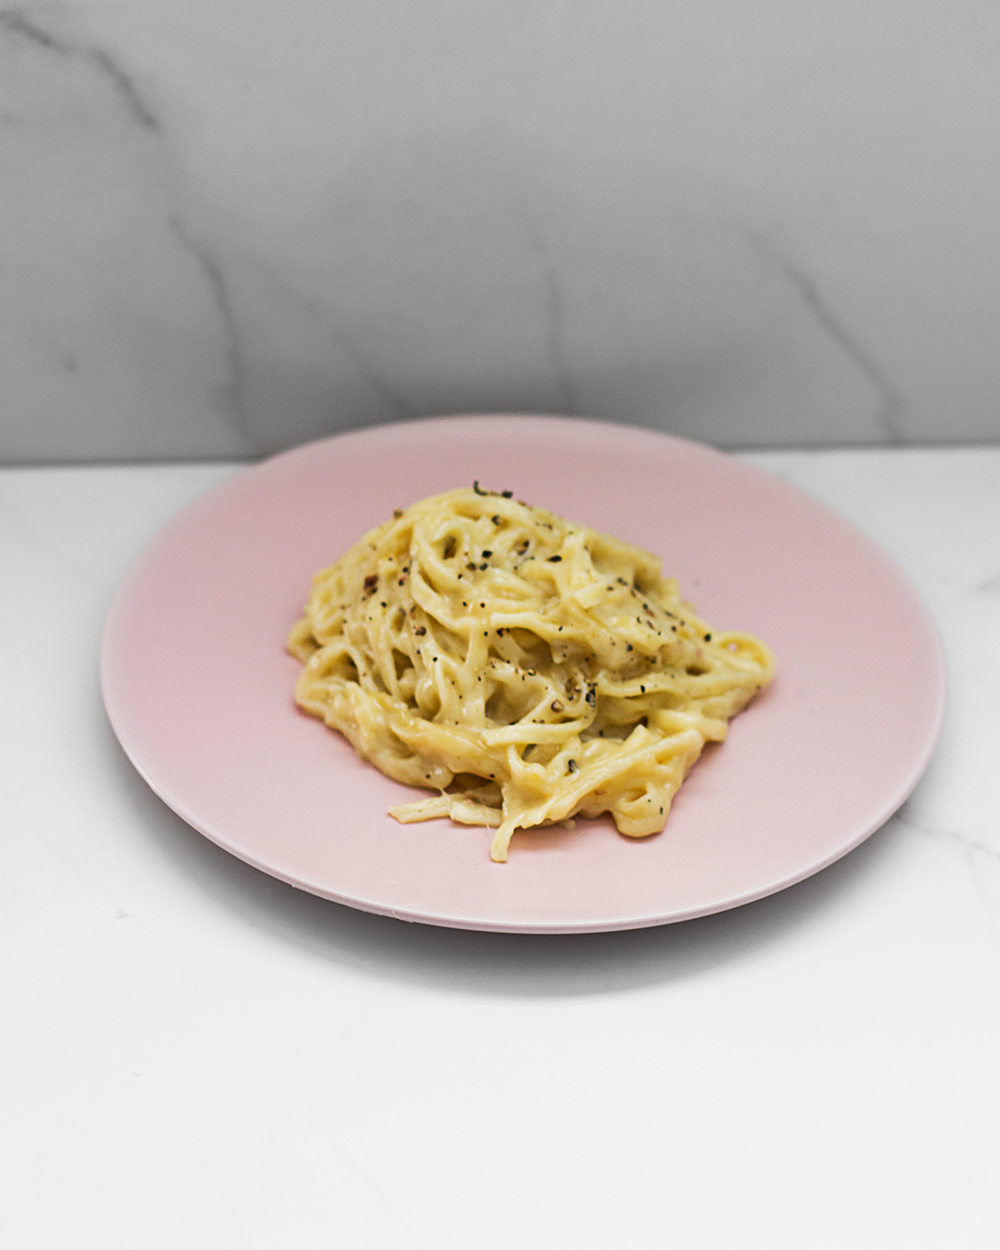 livvyland-blog-olivia-watson-austin-texas-lifestyle-blogger-summer-cacio-e-pepe-pasta-recipe-jessica-lee-3